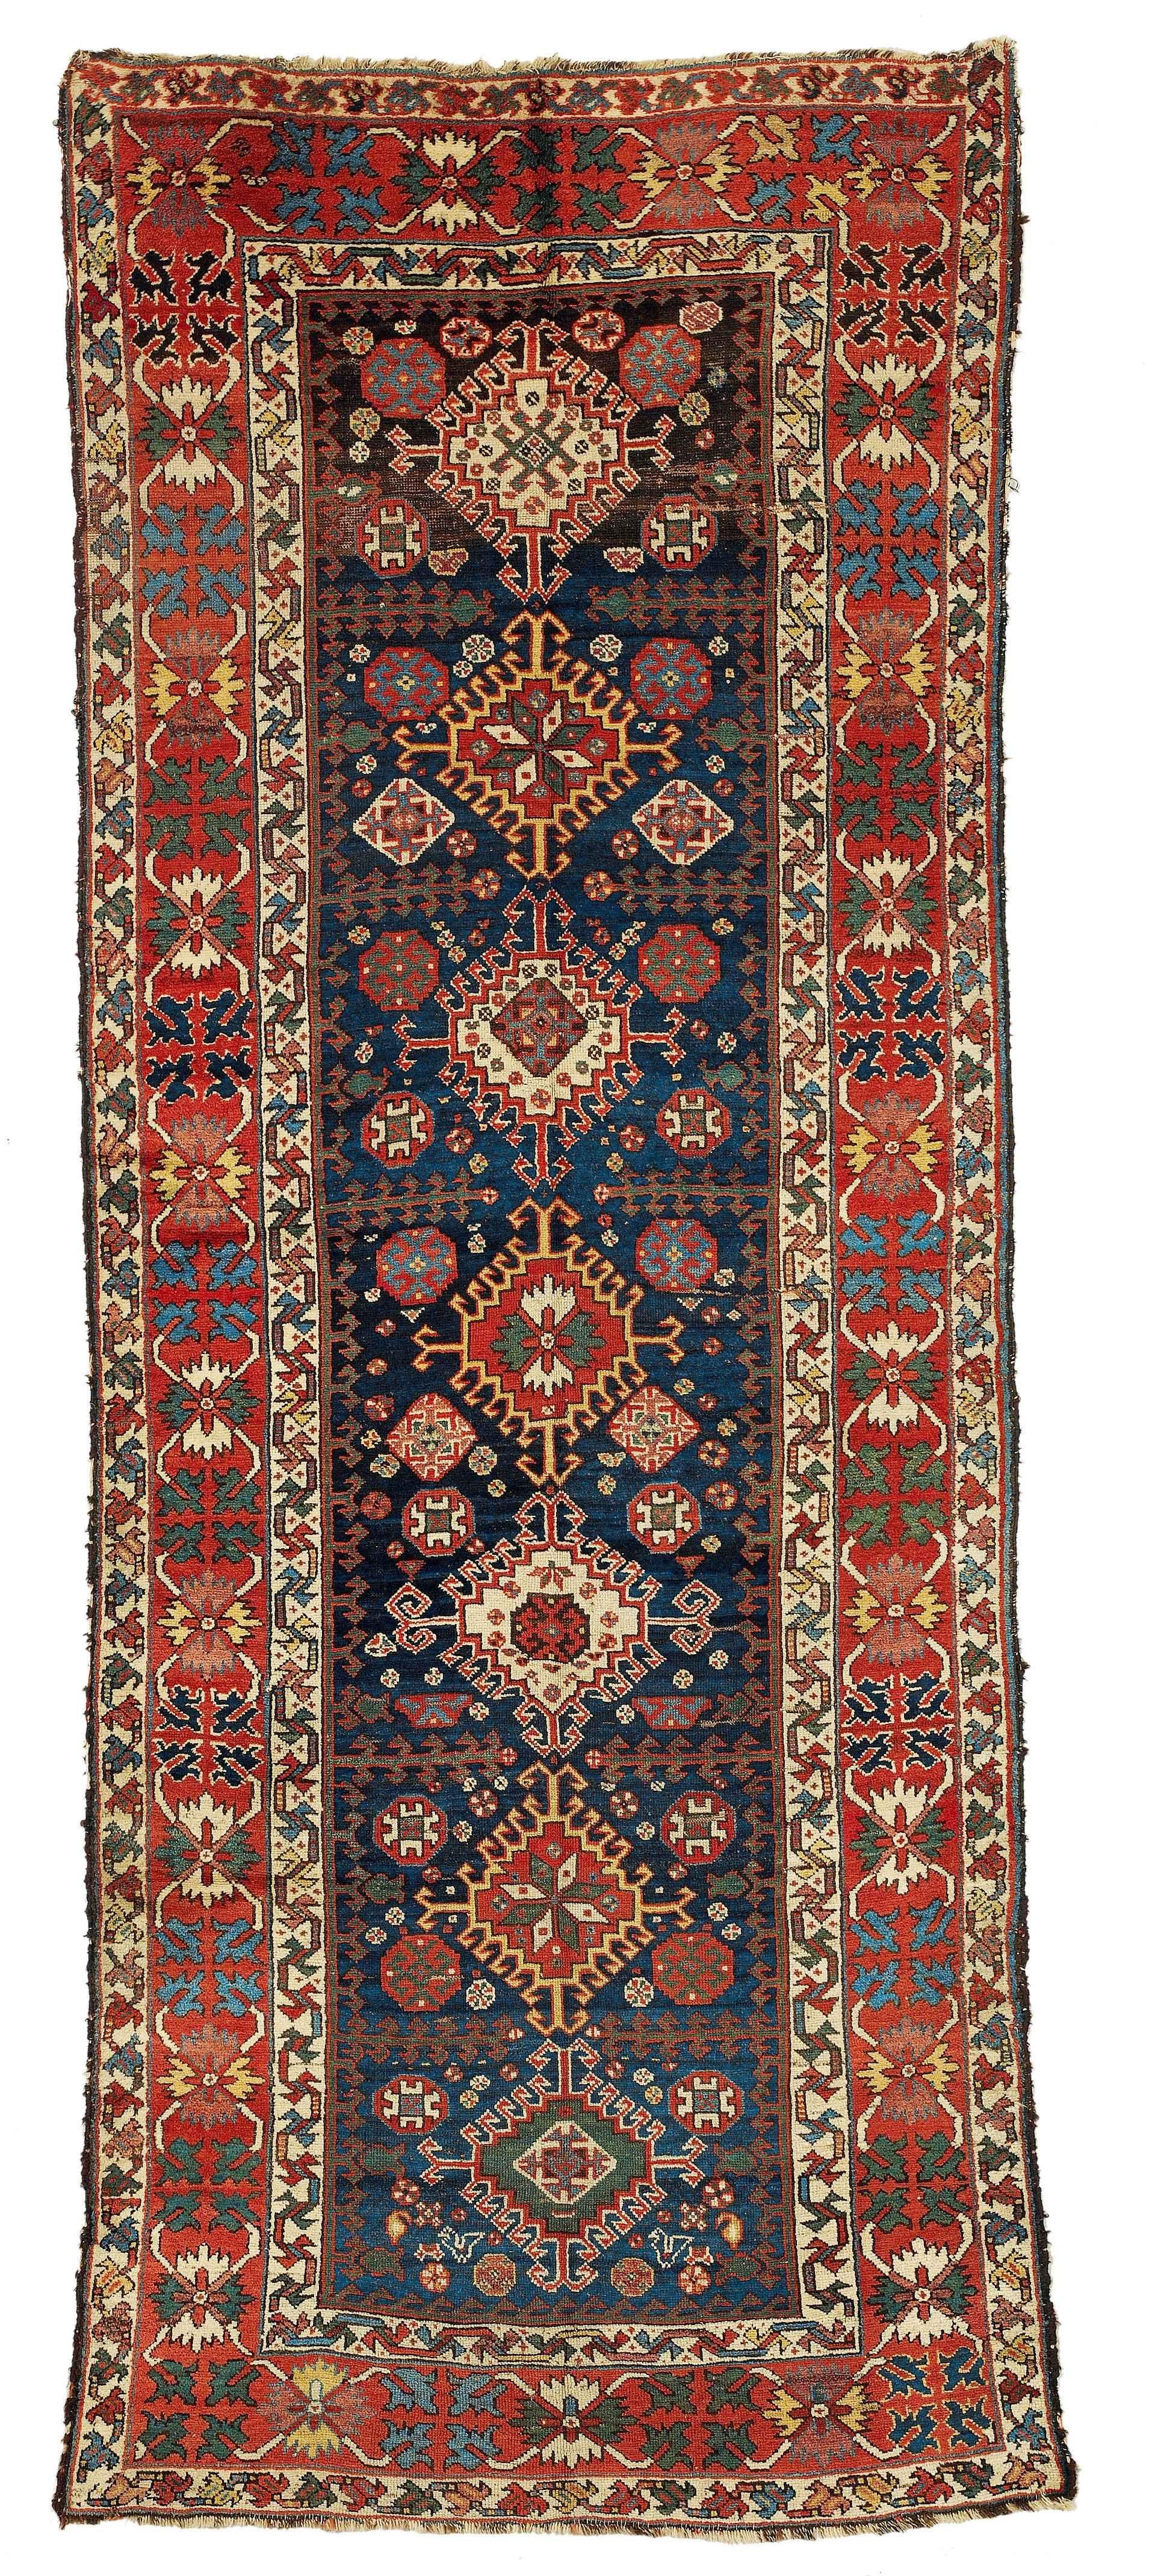 Luri West Persia Luristan West Persia Luristan West Persia Luristan